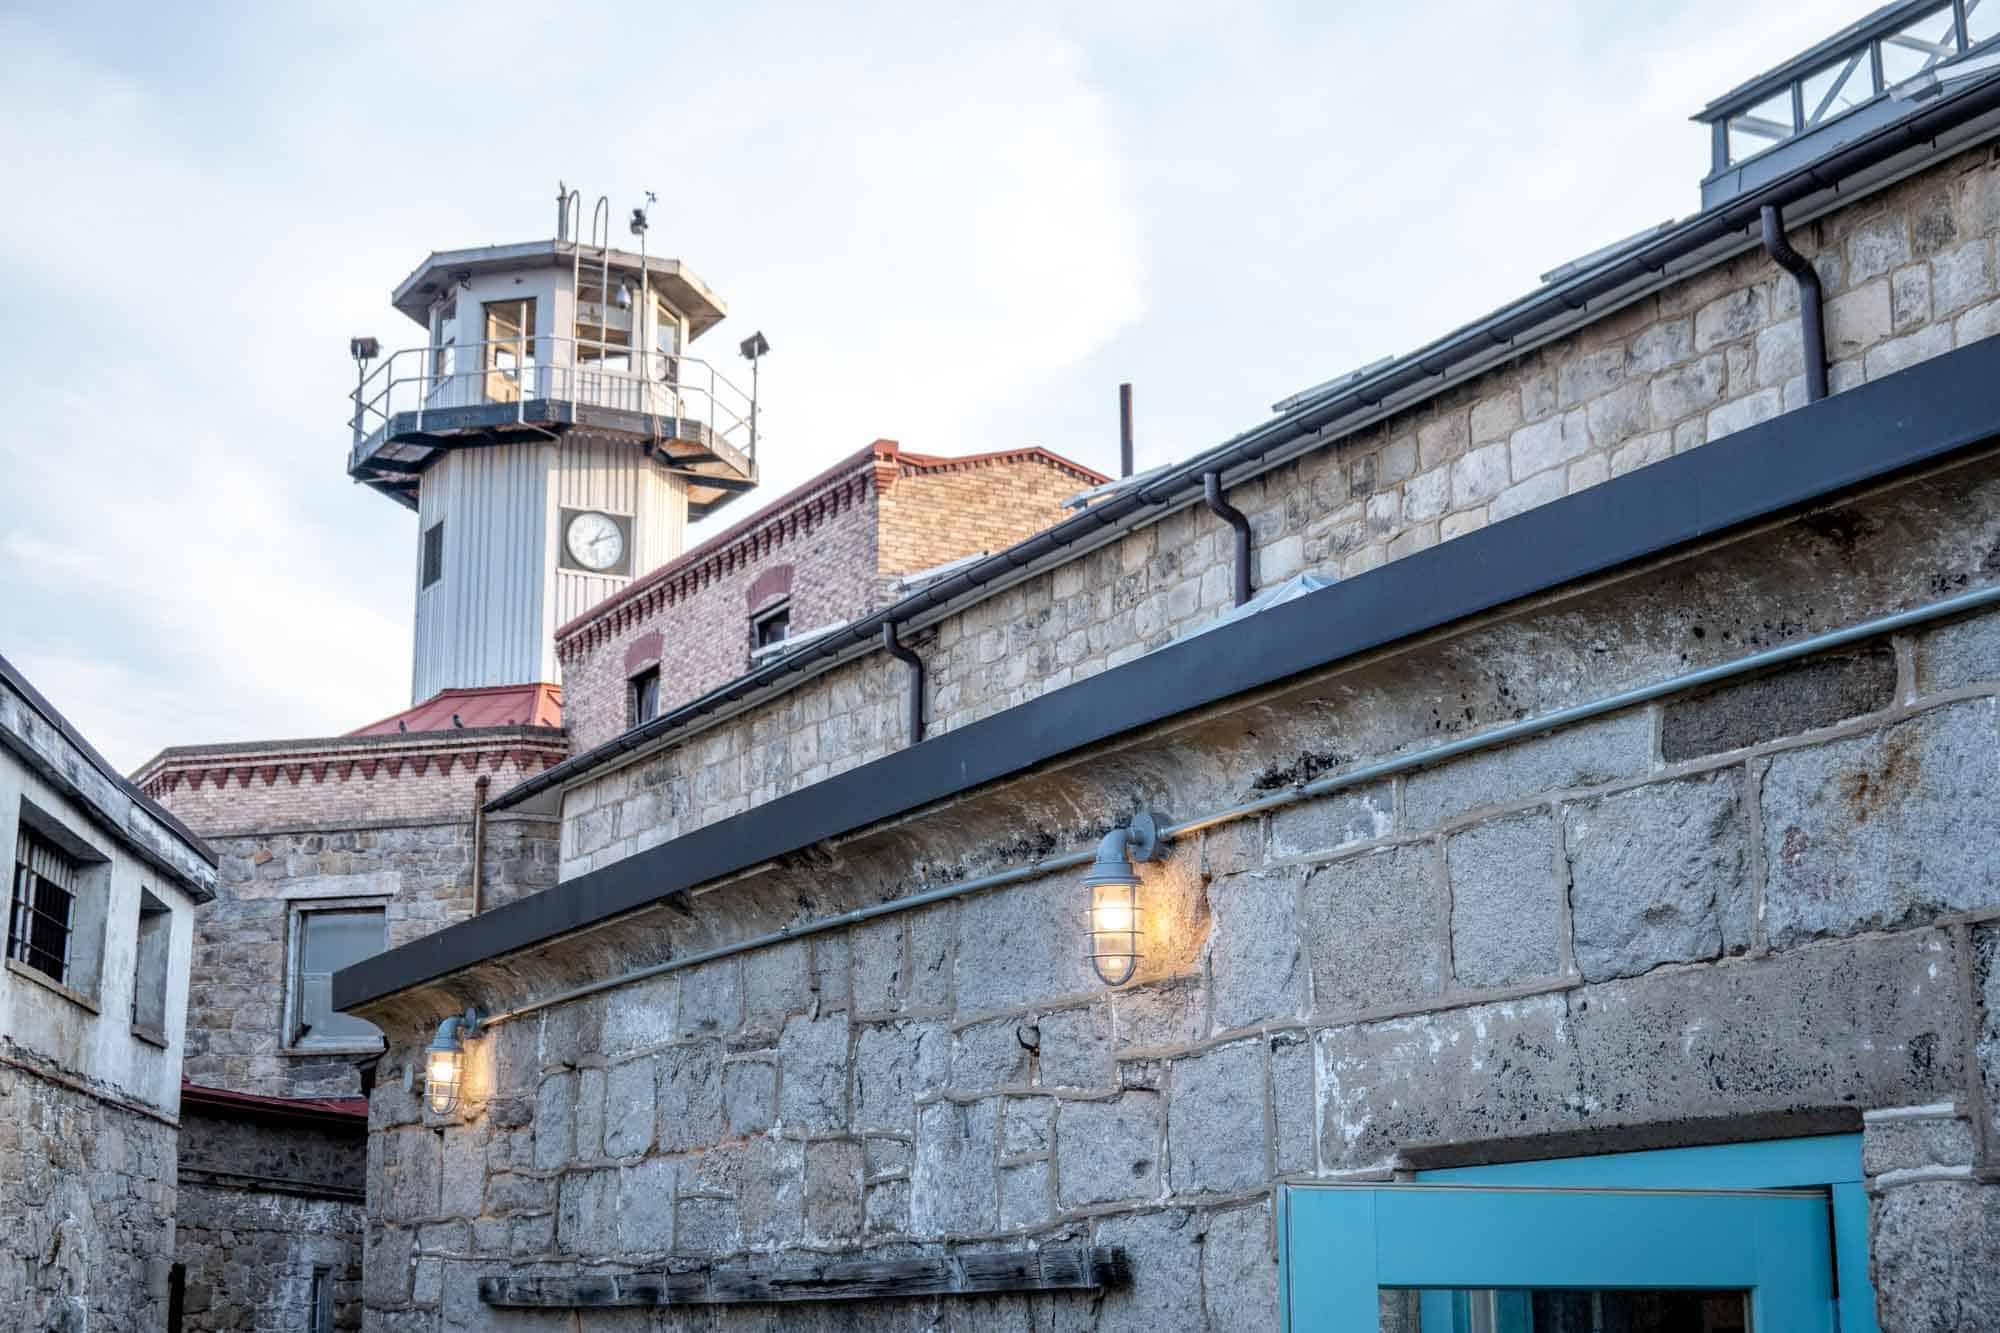 Guard tower over prison